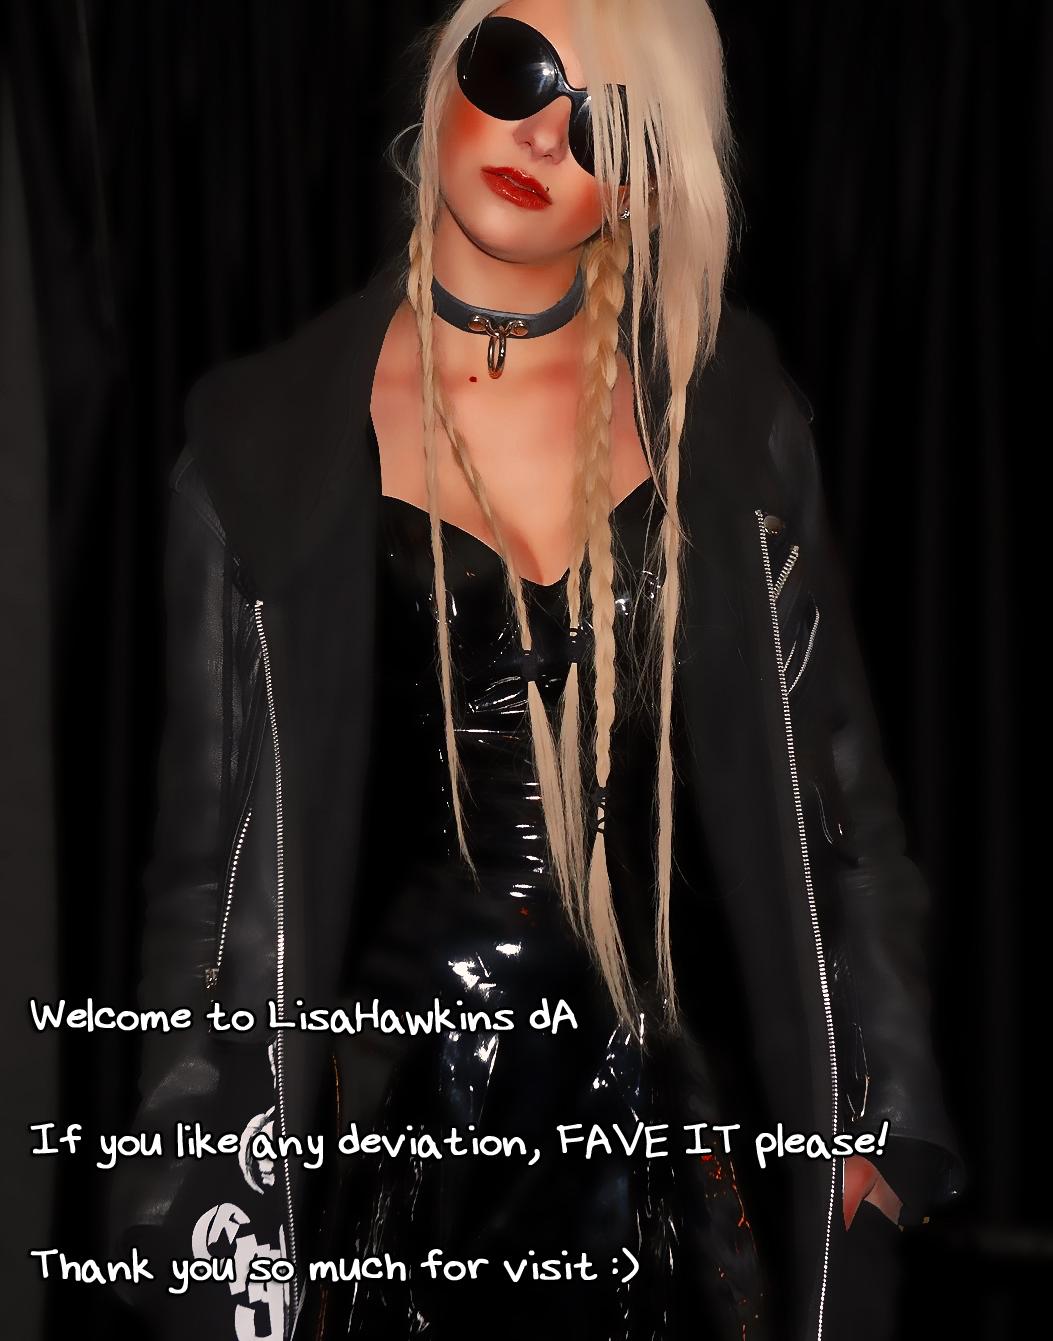 LisaHawkins's Profile Picture